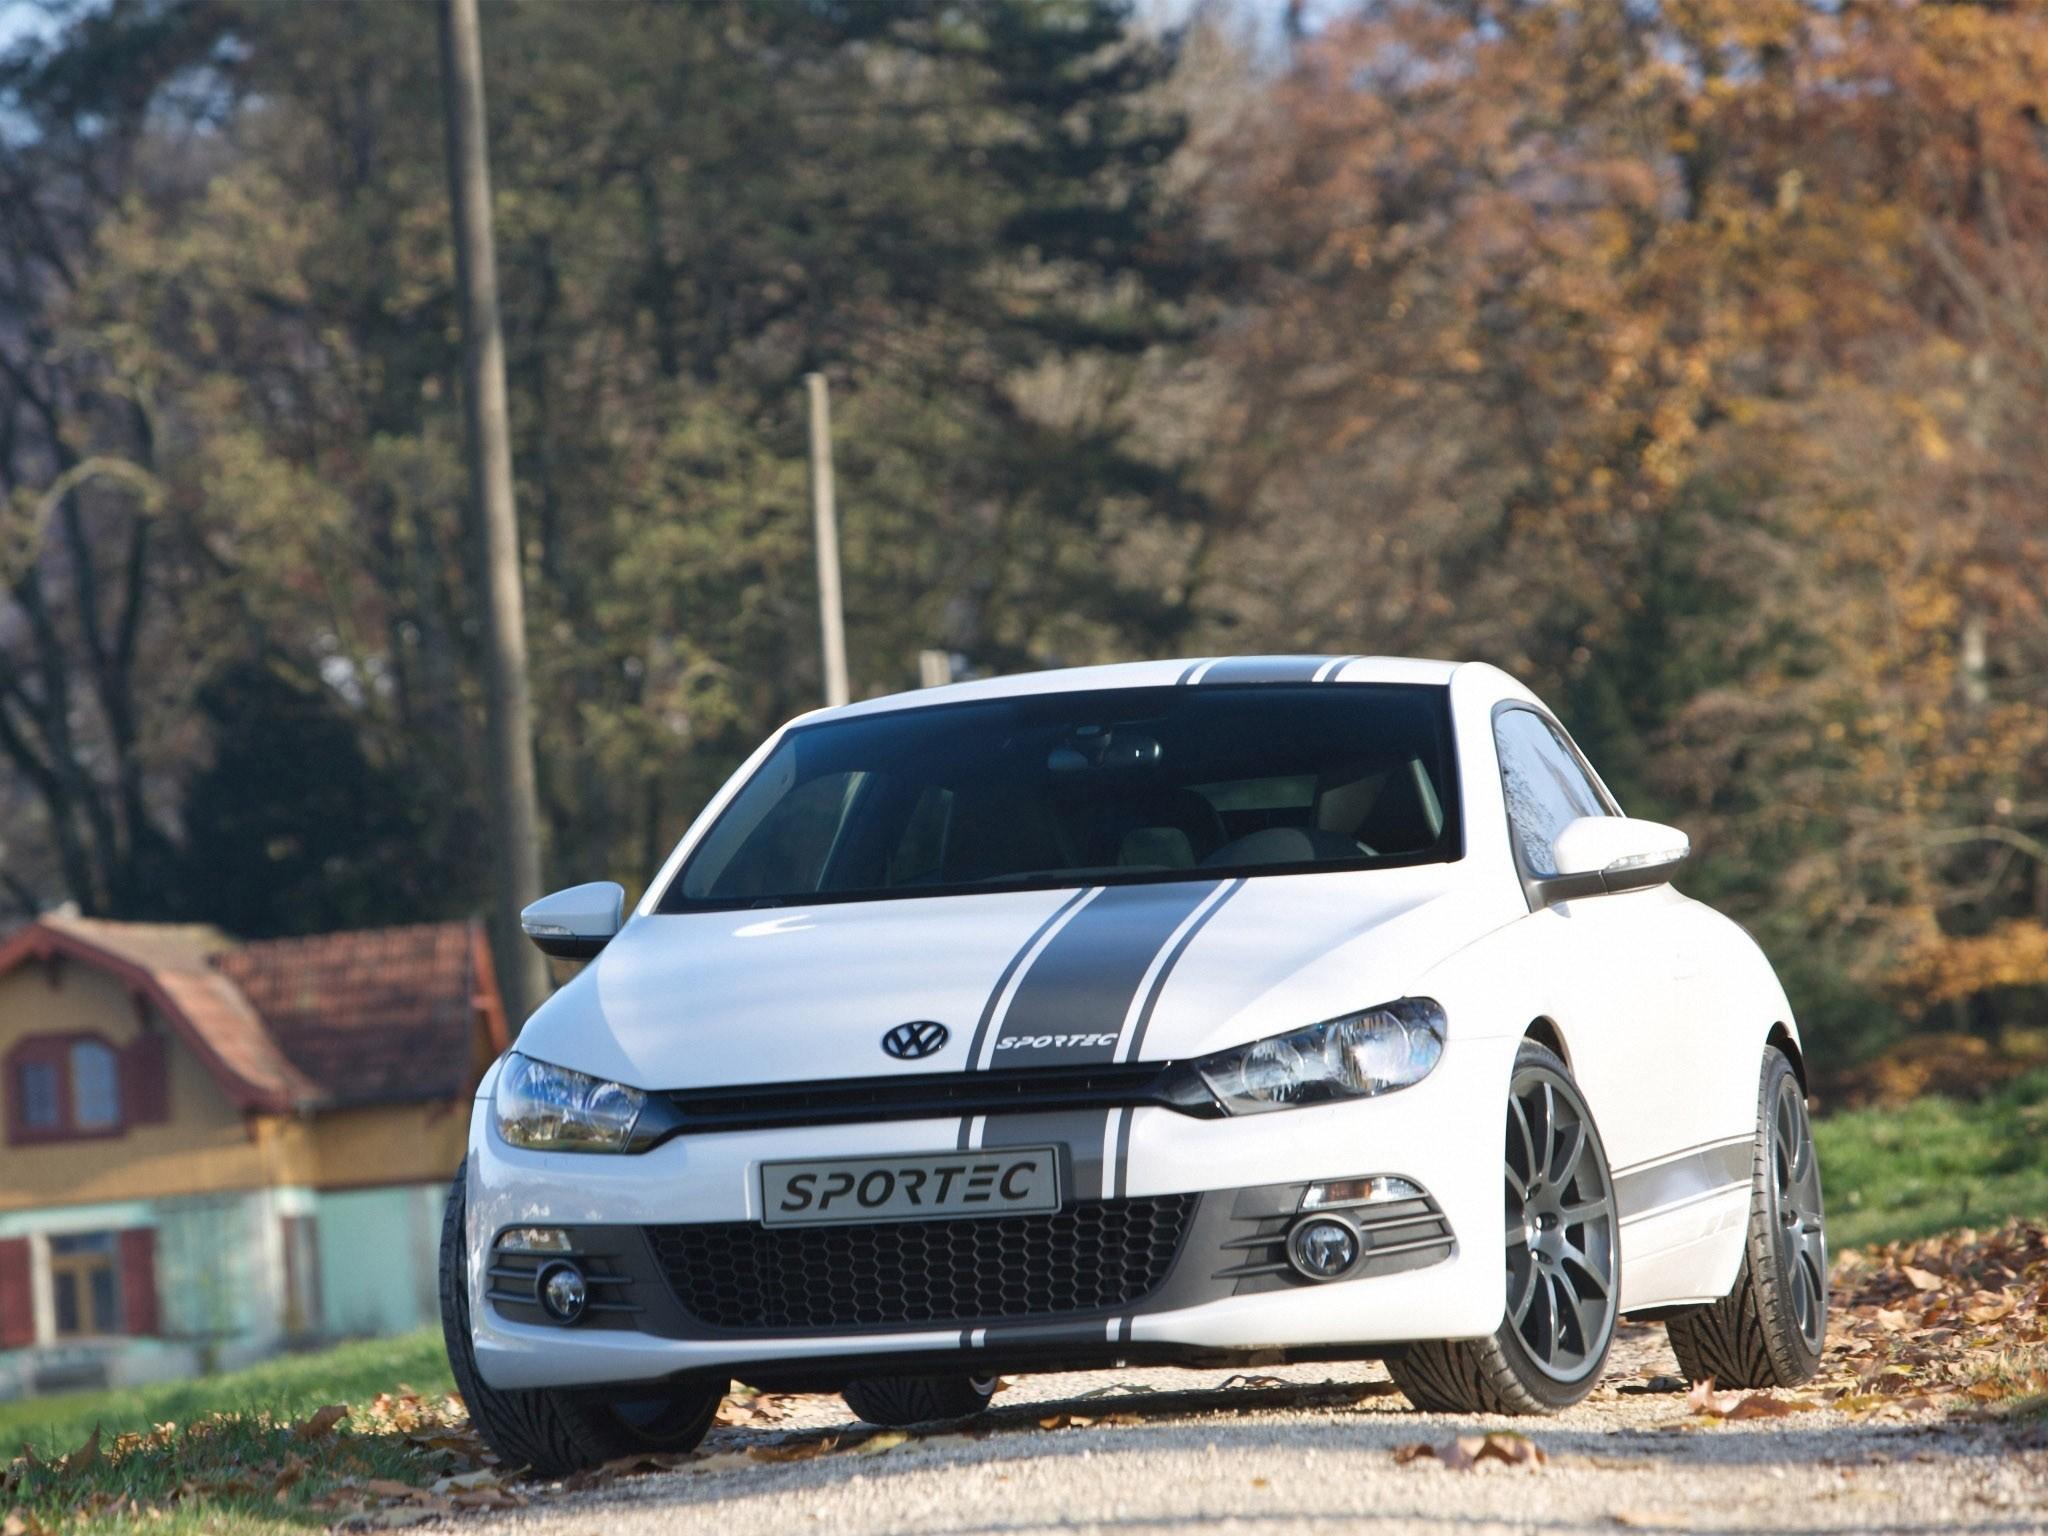 2009 Sportec Volkswagen Scirocco SC350